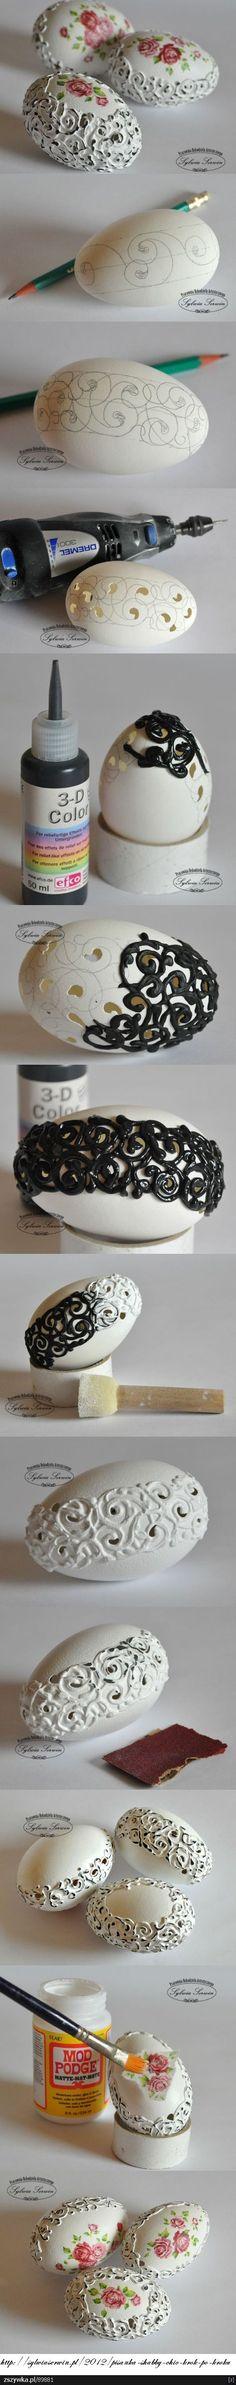 Eier mit 3-D-Farbe